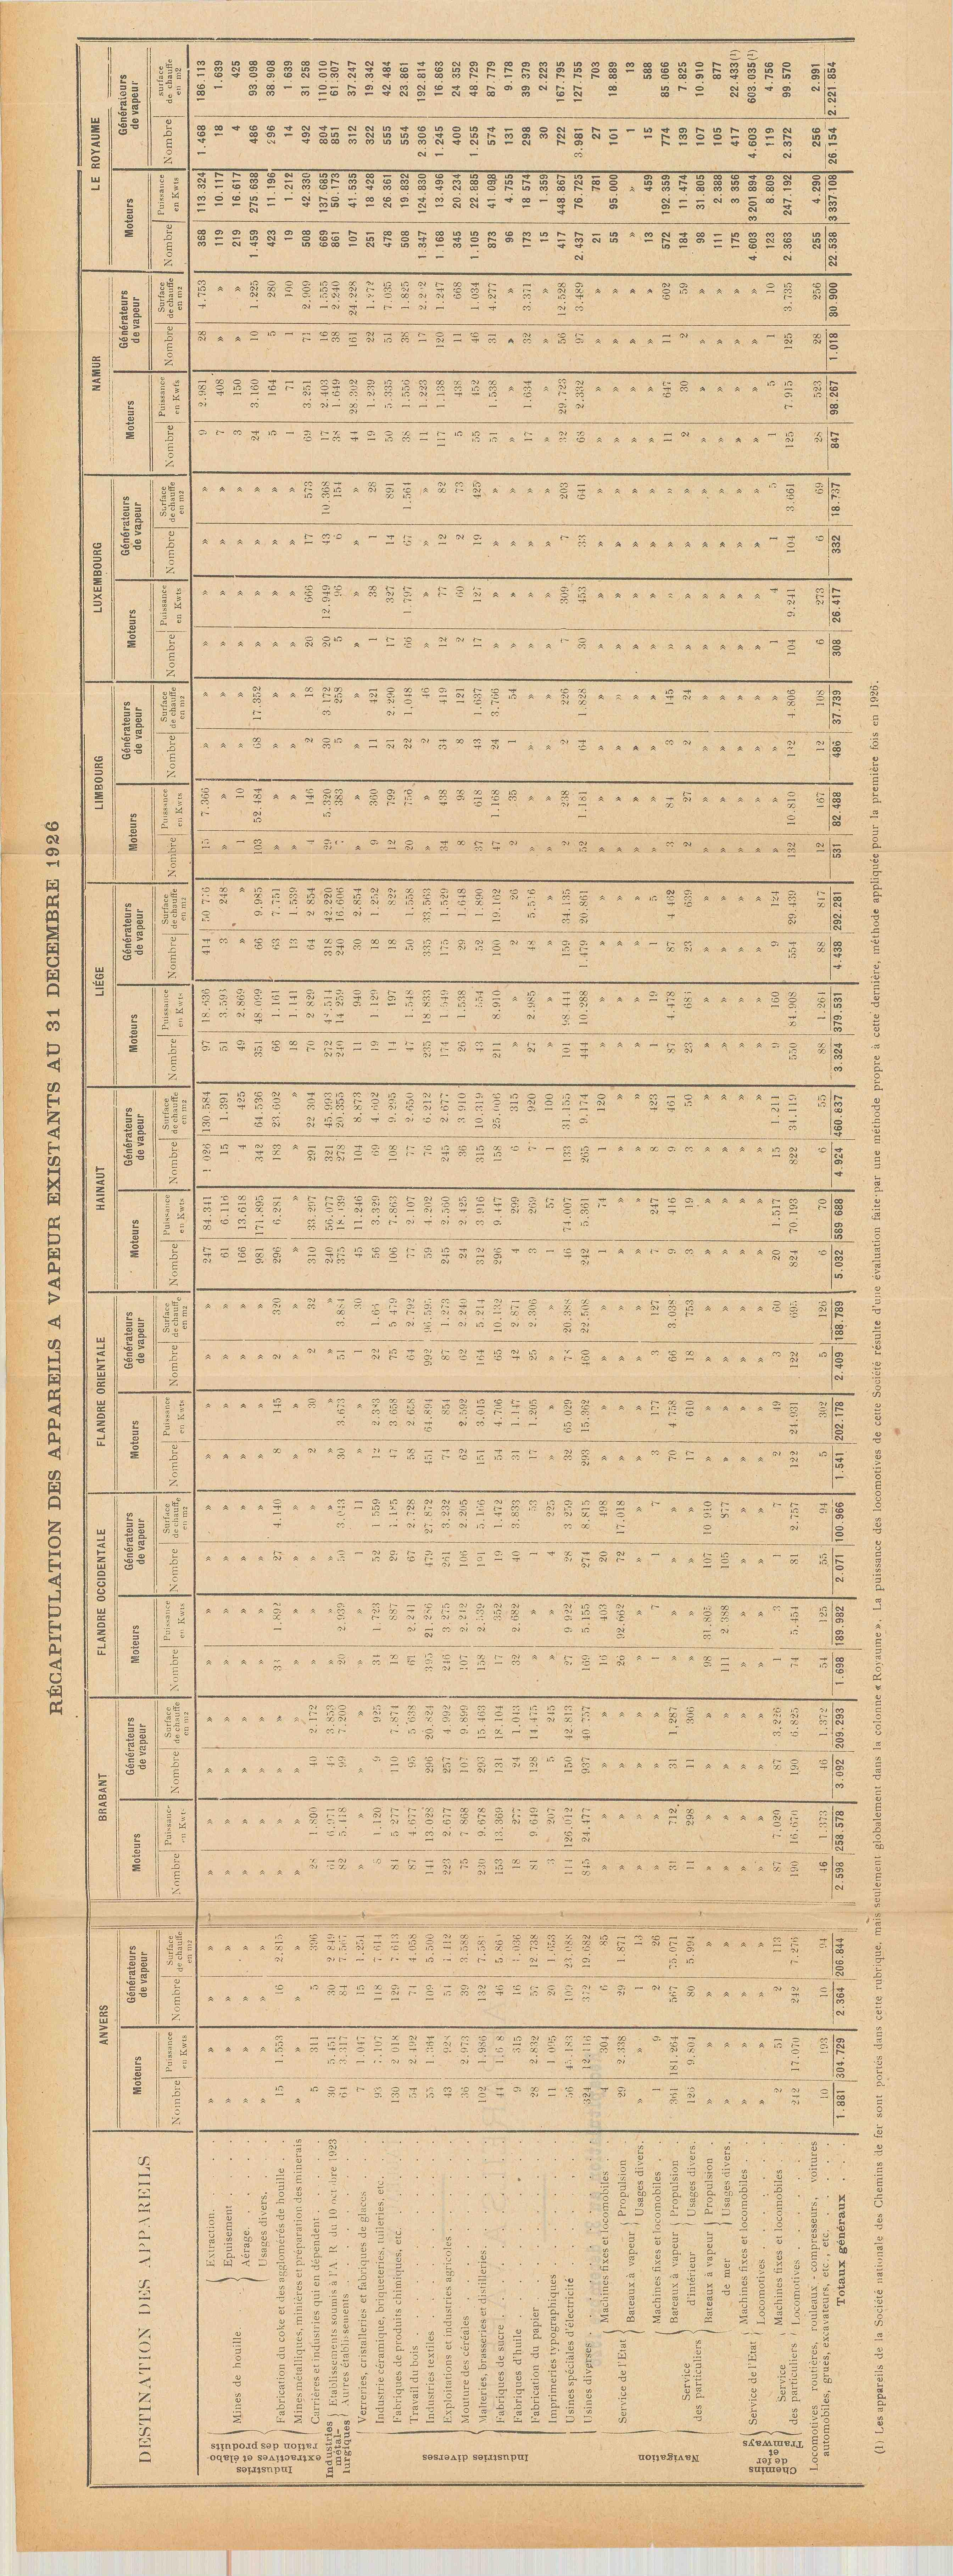 1927 1000 13 tab.jpg